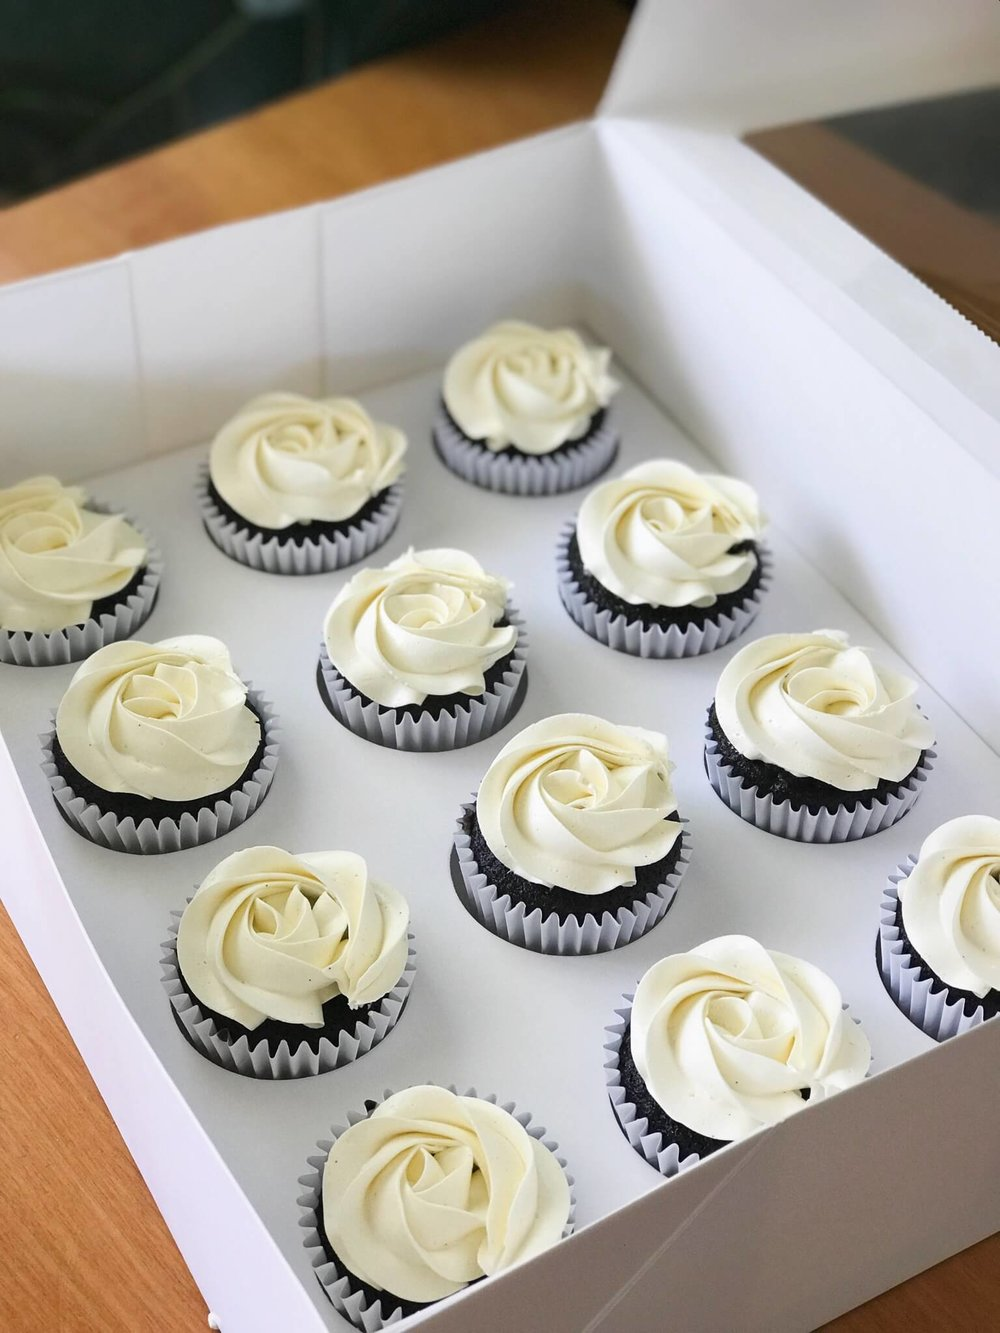 Cupcakes, birthday, white, rosettes.jpg